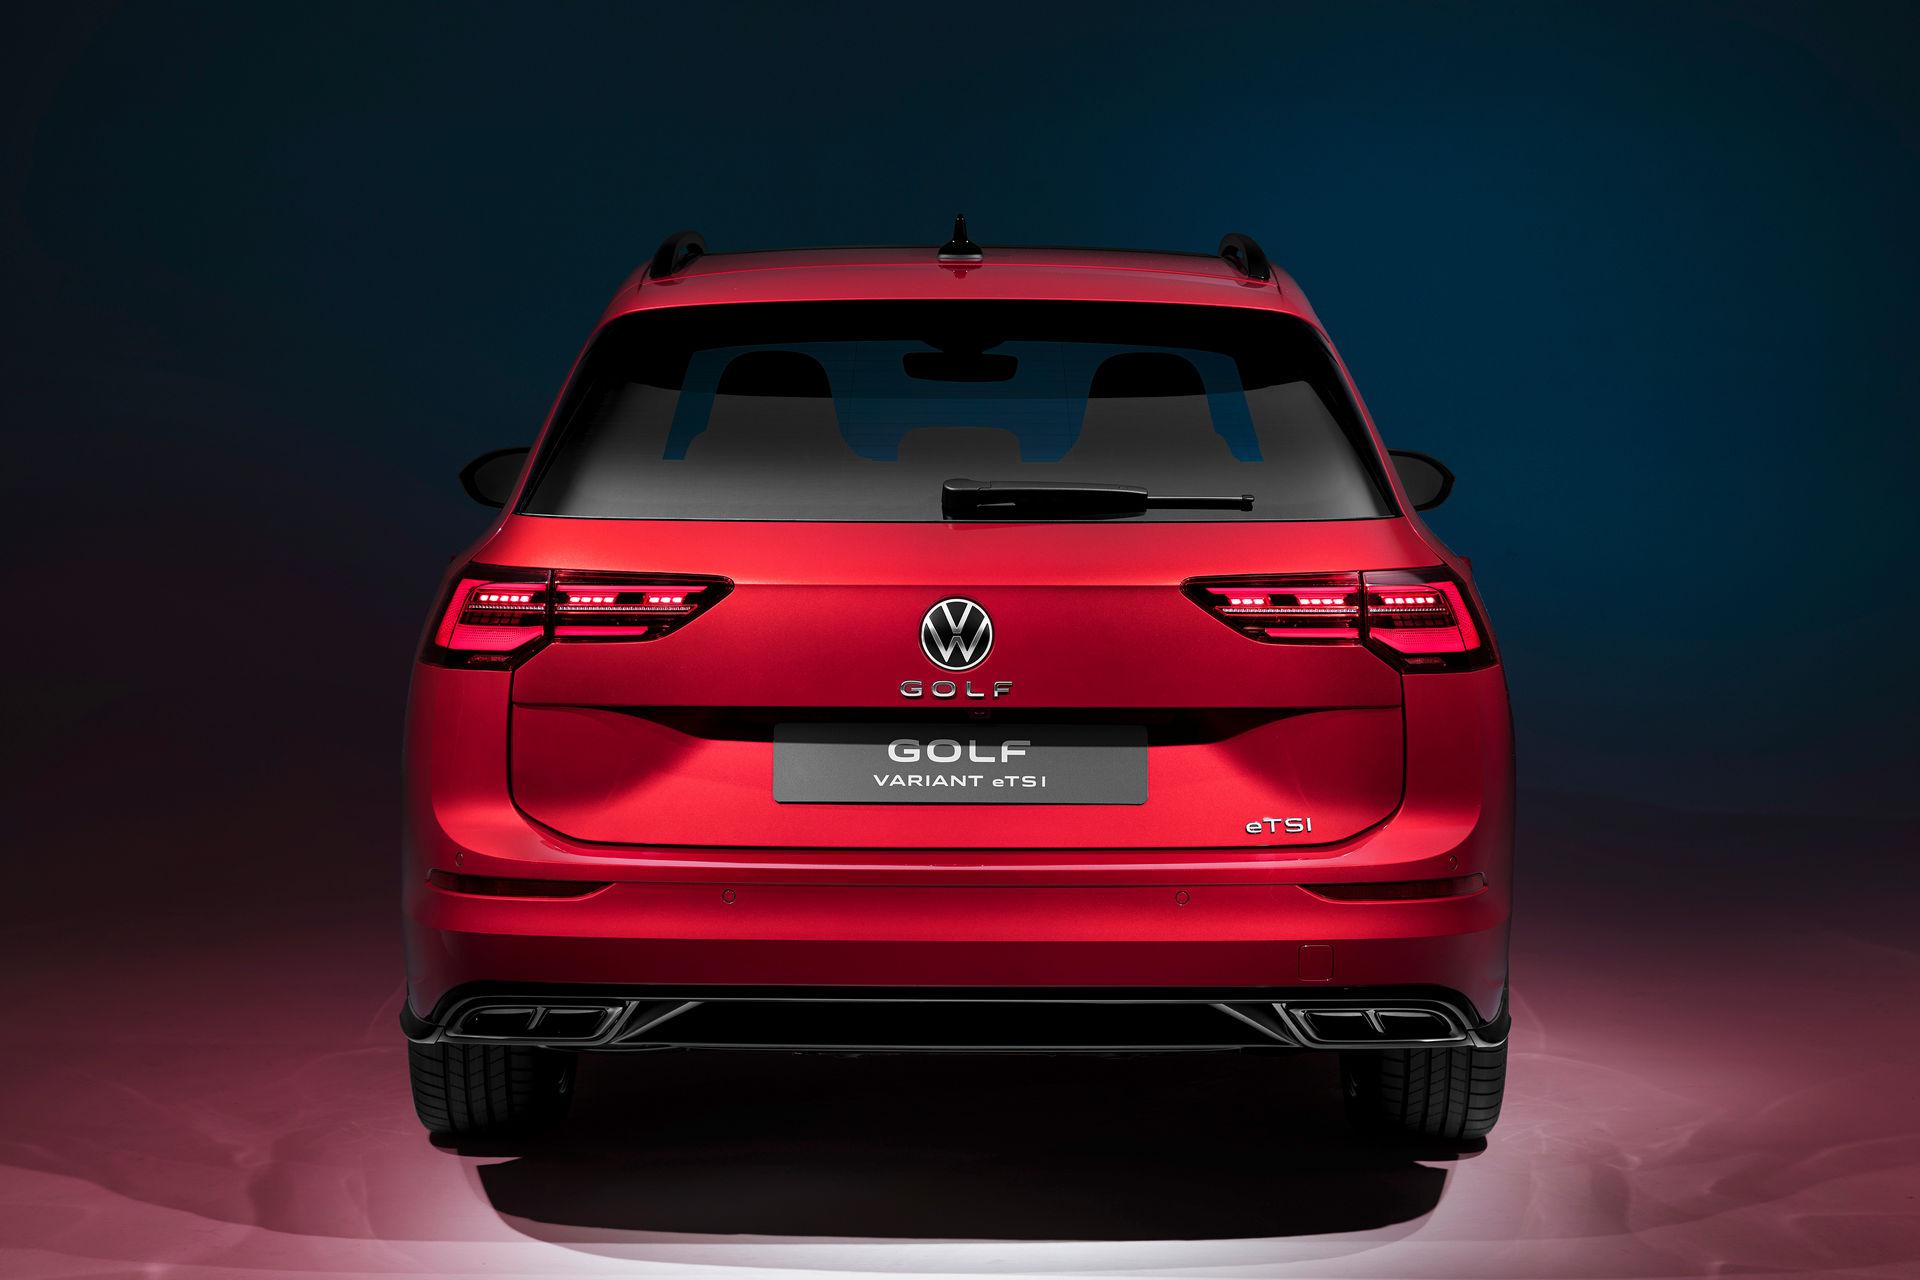 VW GOLF VARIANT 7